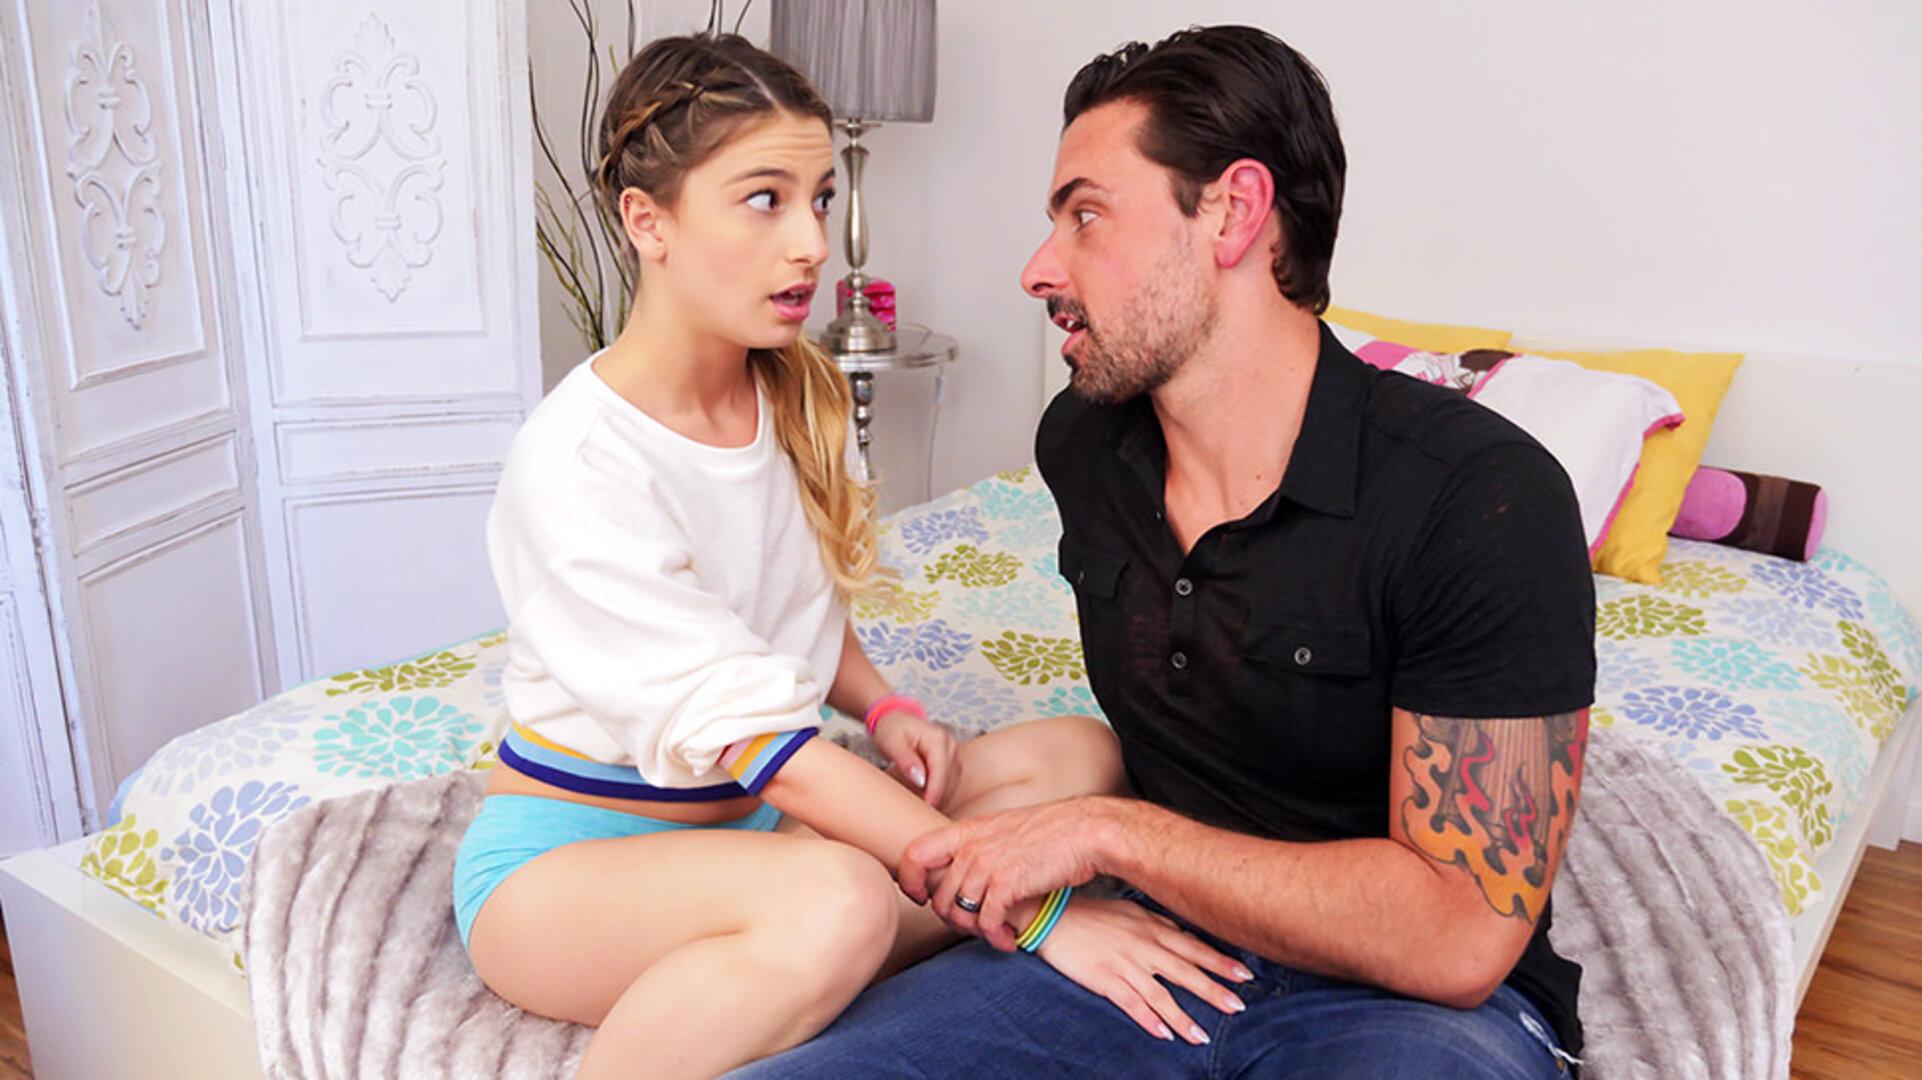 Interracial Step Daughter Anal